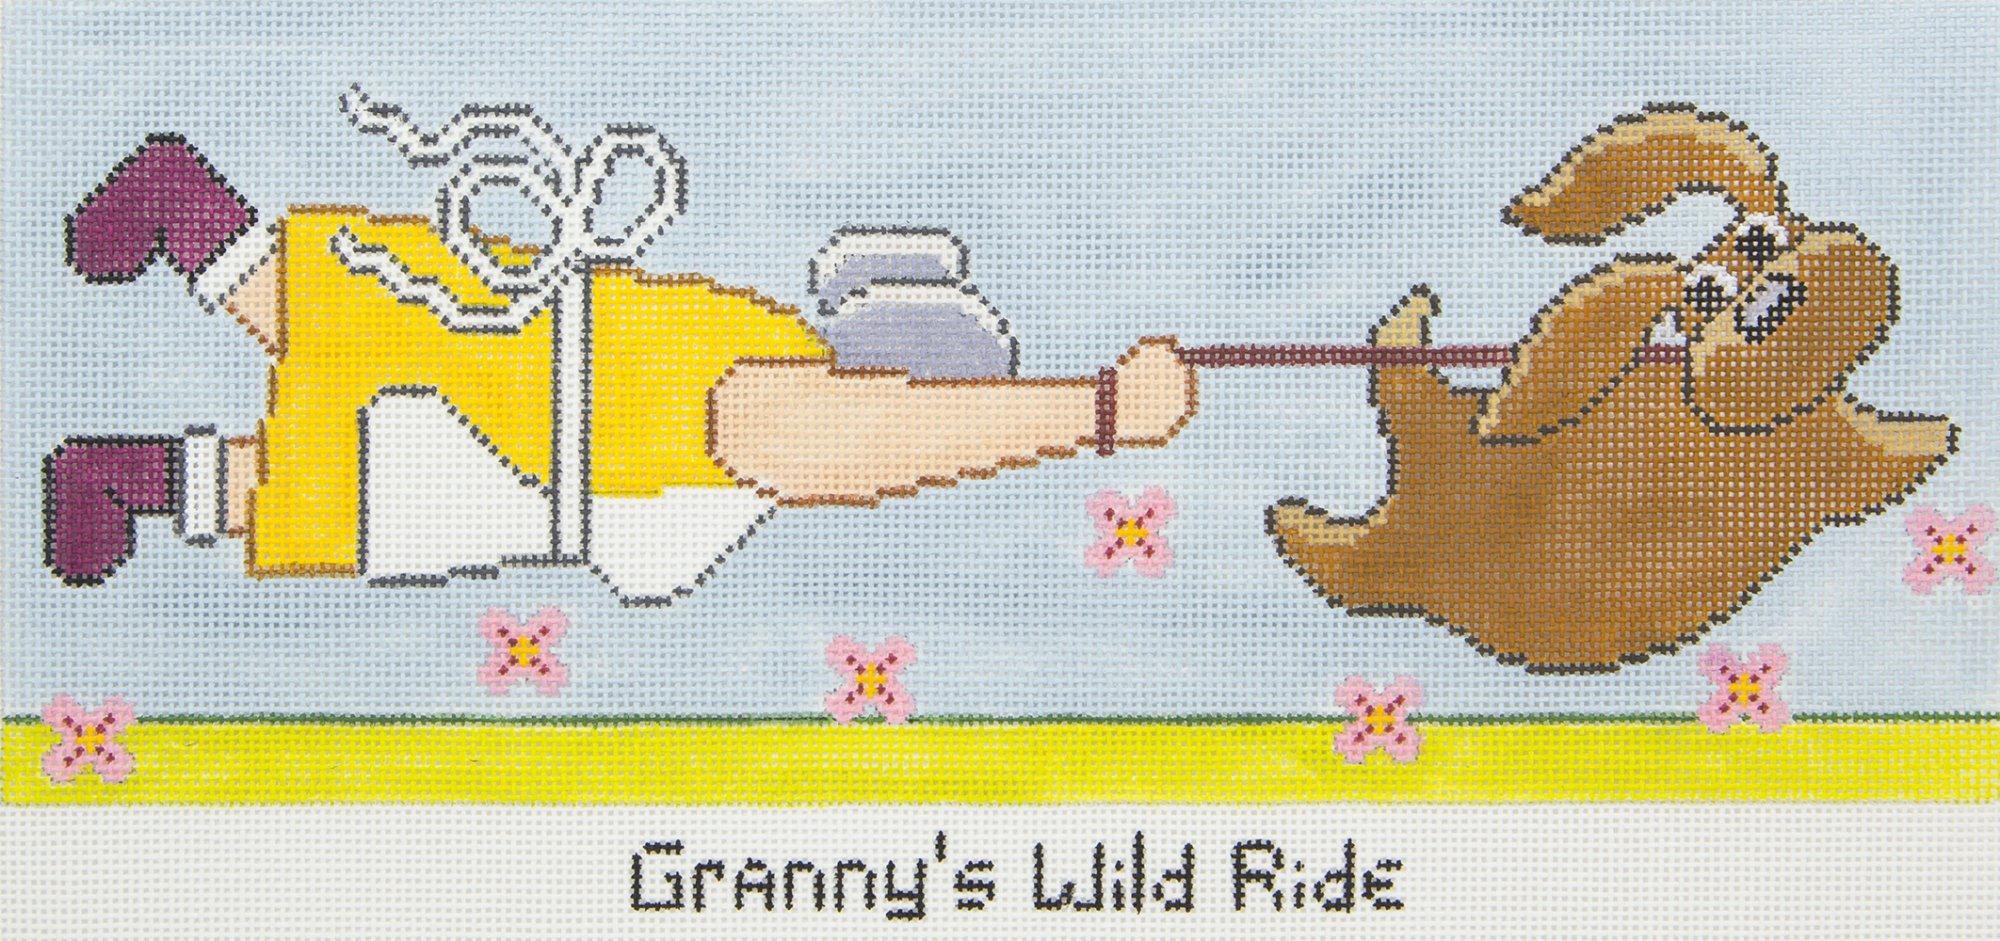 AL0155 Granny's Wild Ride Wellesley